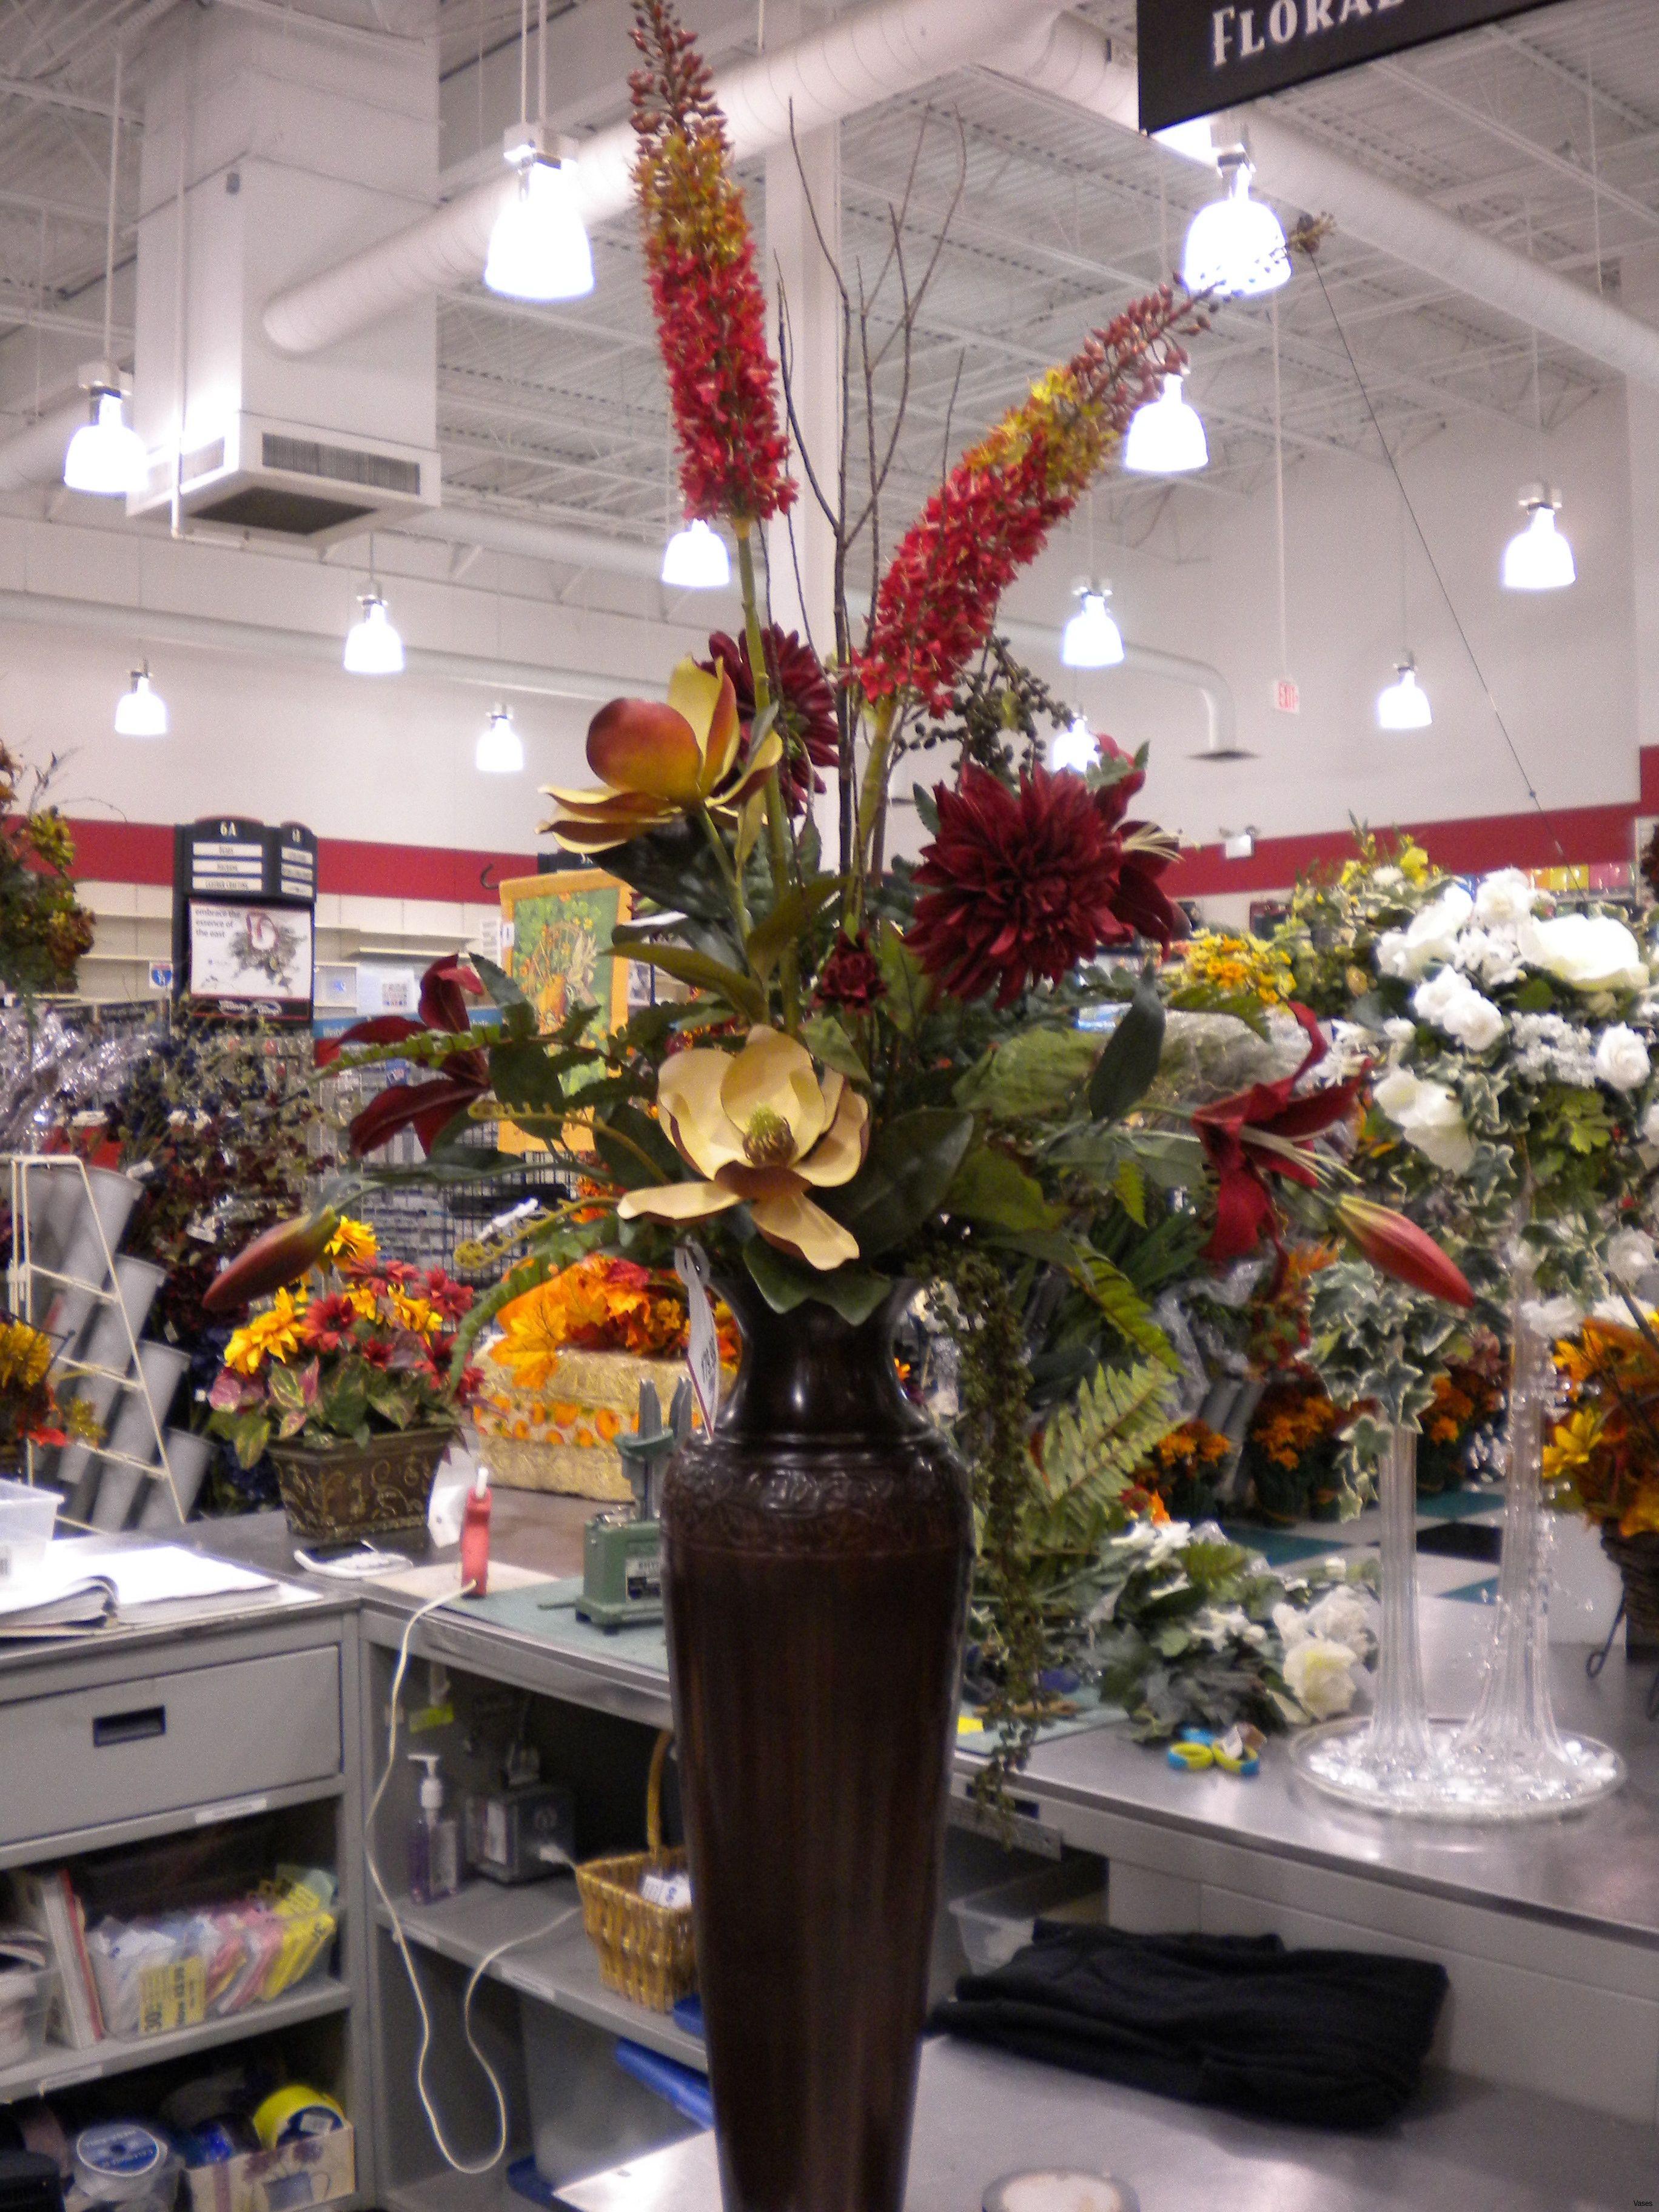 tall gold vases of gold mercury vases fresh h vases for flower arrangements i 0d dry for gold mercury vases fresh h vases for flower arrangements i 0d dry design ideas fake orchid